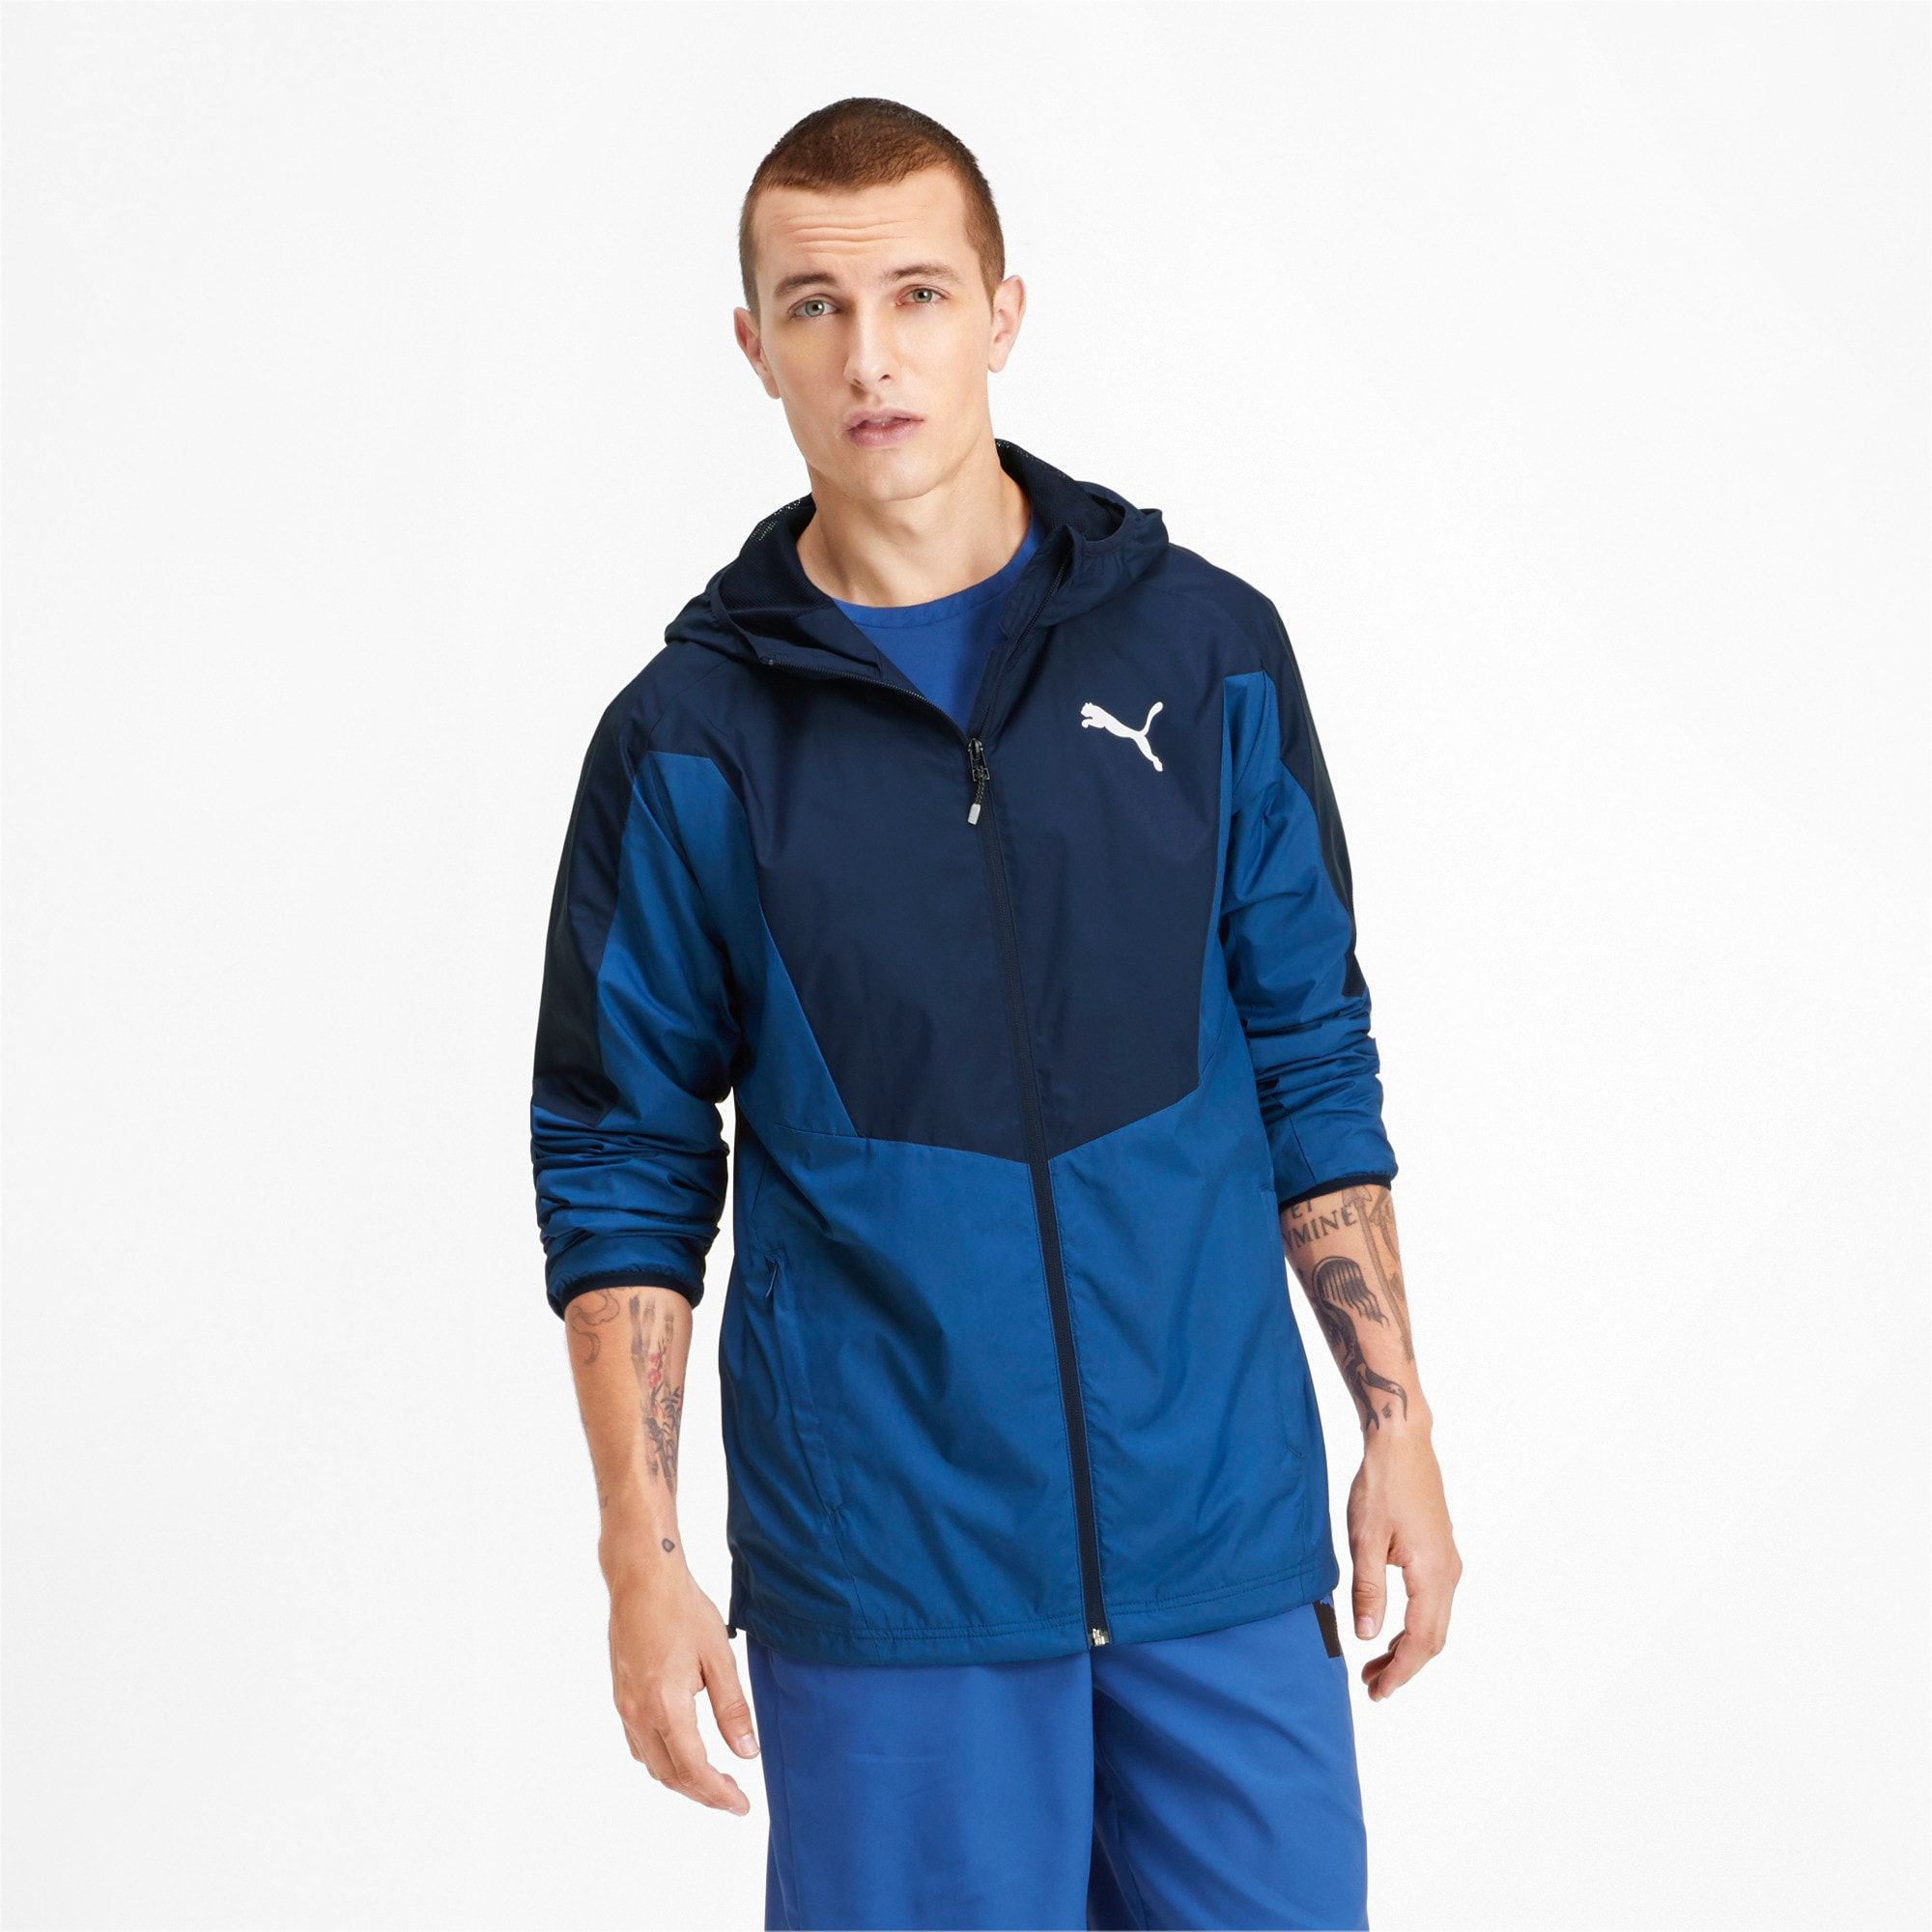 PUMA Active Sporty Men's Windbreaker Jacket in Galaxy Blue/Peacoat size 2X Large